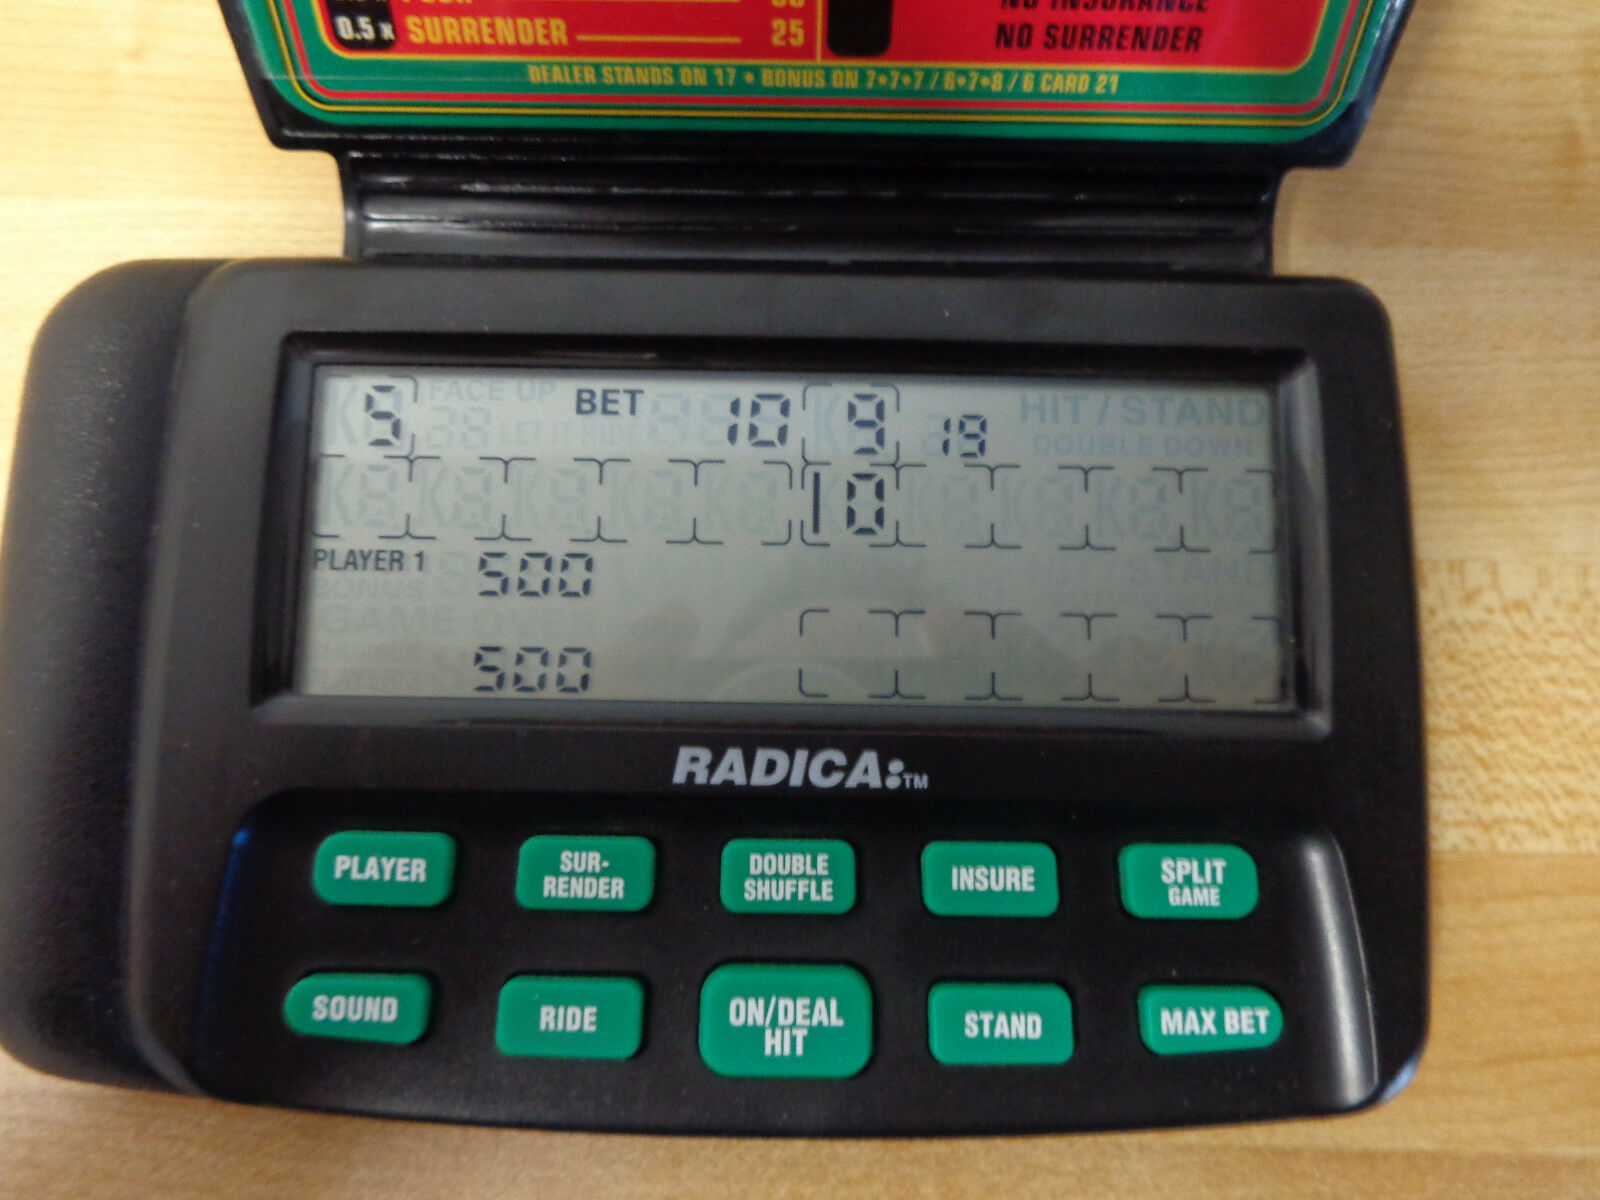 Radica Blackjack 21 Instructions Handheld Electronic Game 2355 Ebay